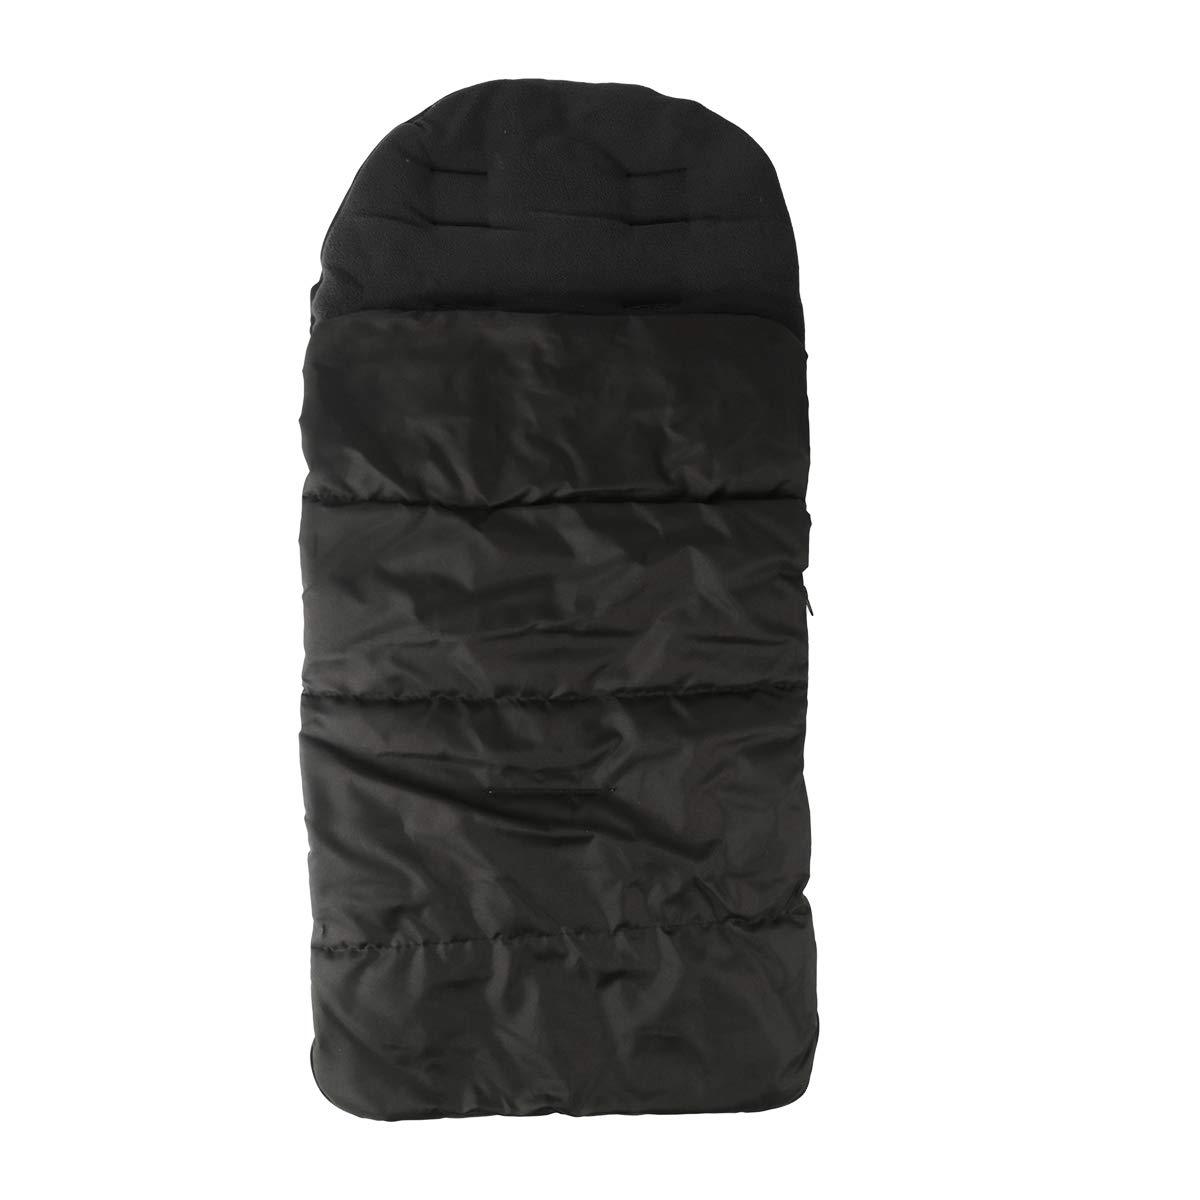 Baby Bunting Bag Very popular Universal 3-in-1 Sleepi Fees free!! Windproof Warm Stroller